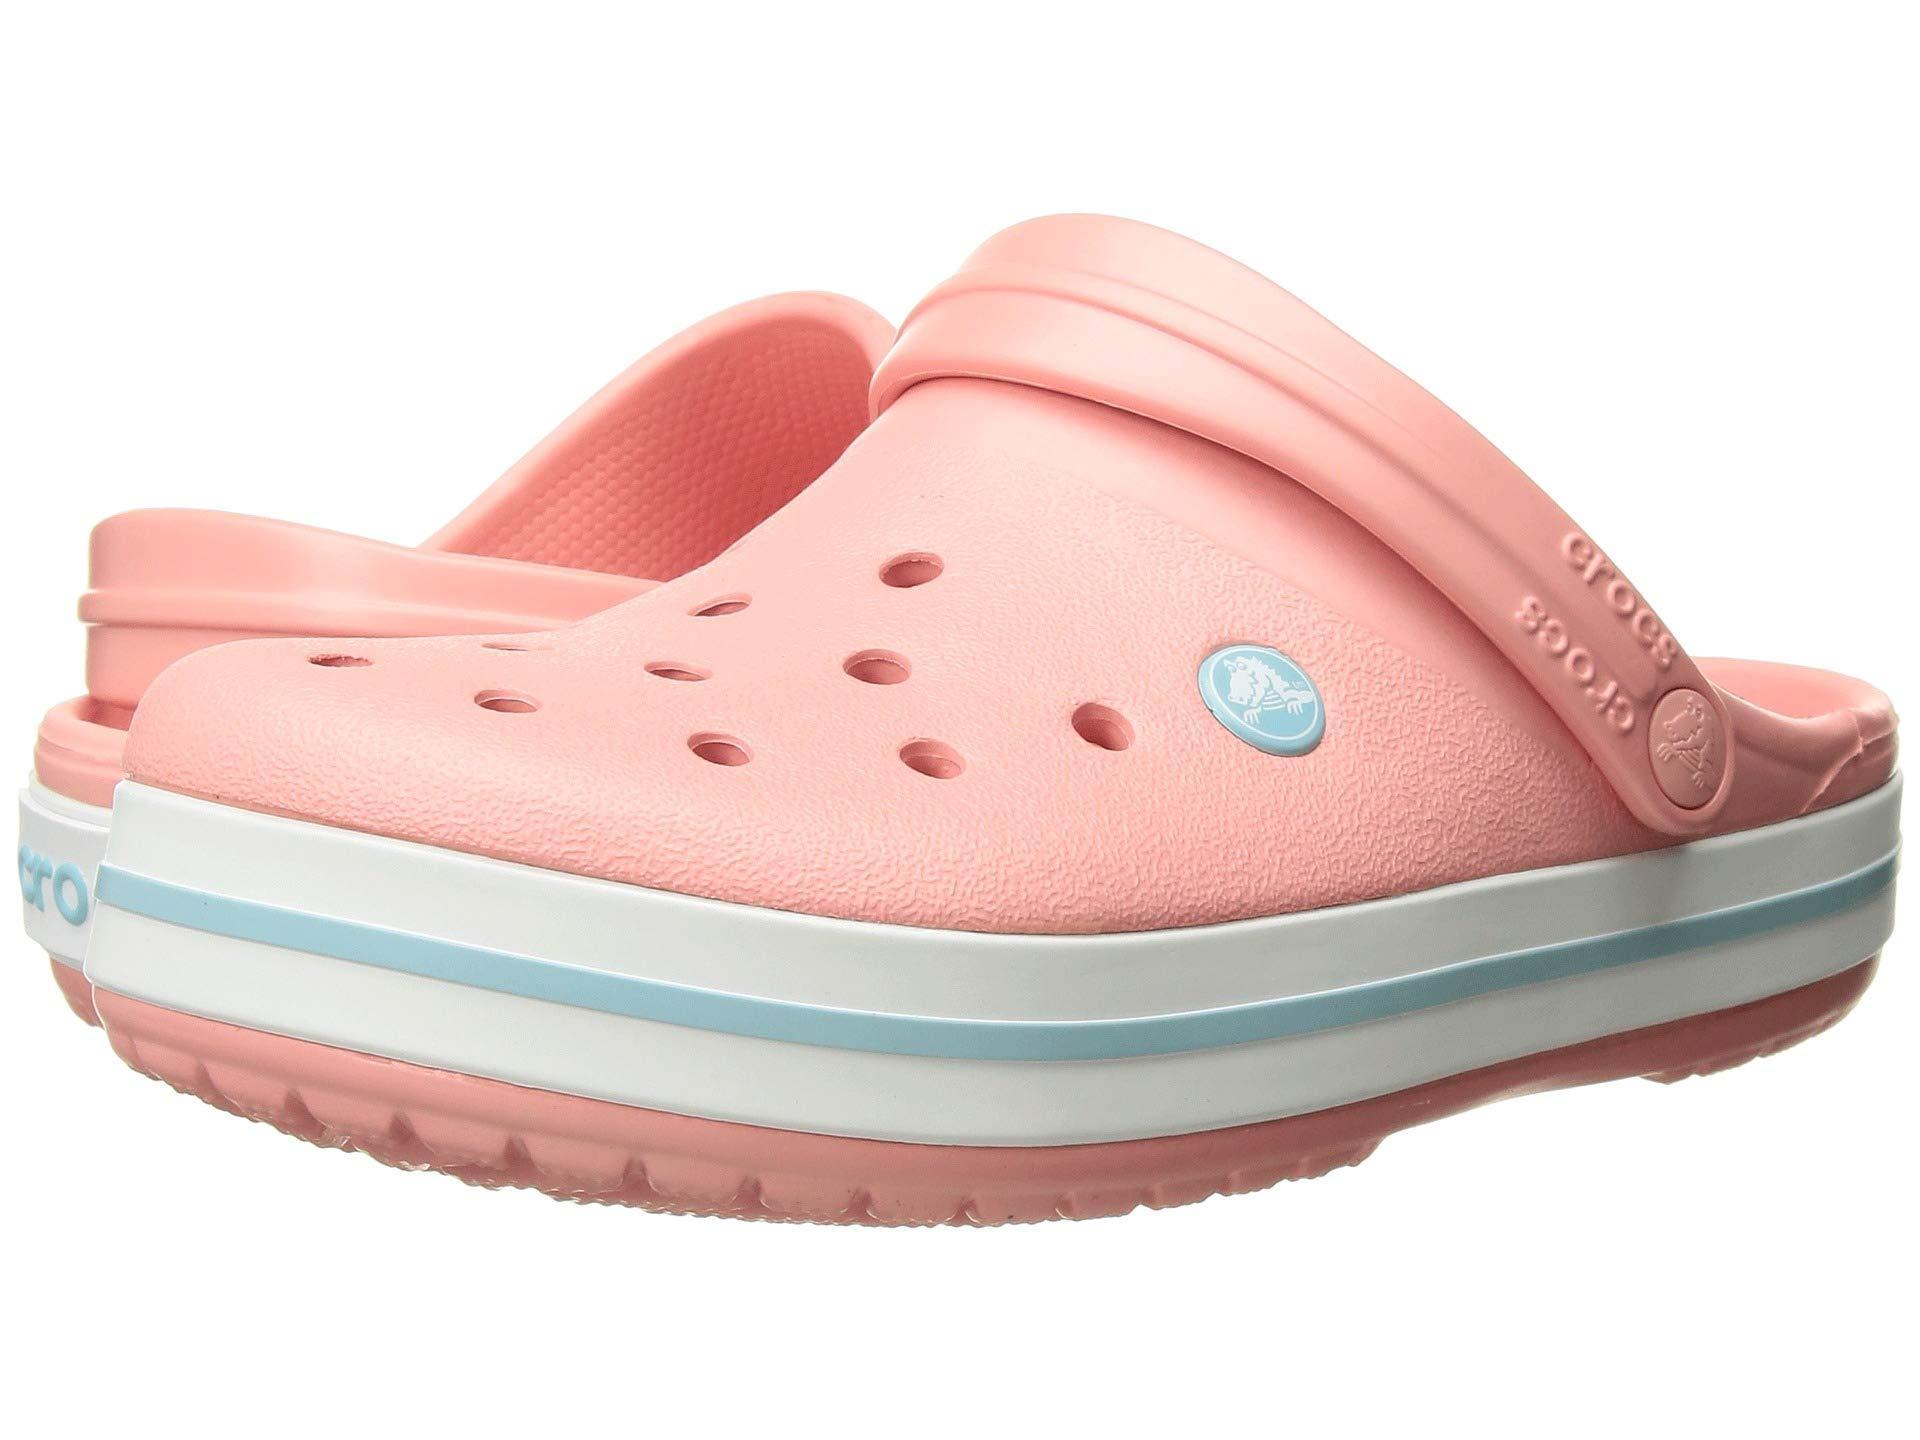 f07b0b0d0 Lyst - Crocs™ Crocband Clog (light Grey bright Coral) Clog Shoes in Pink